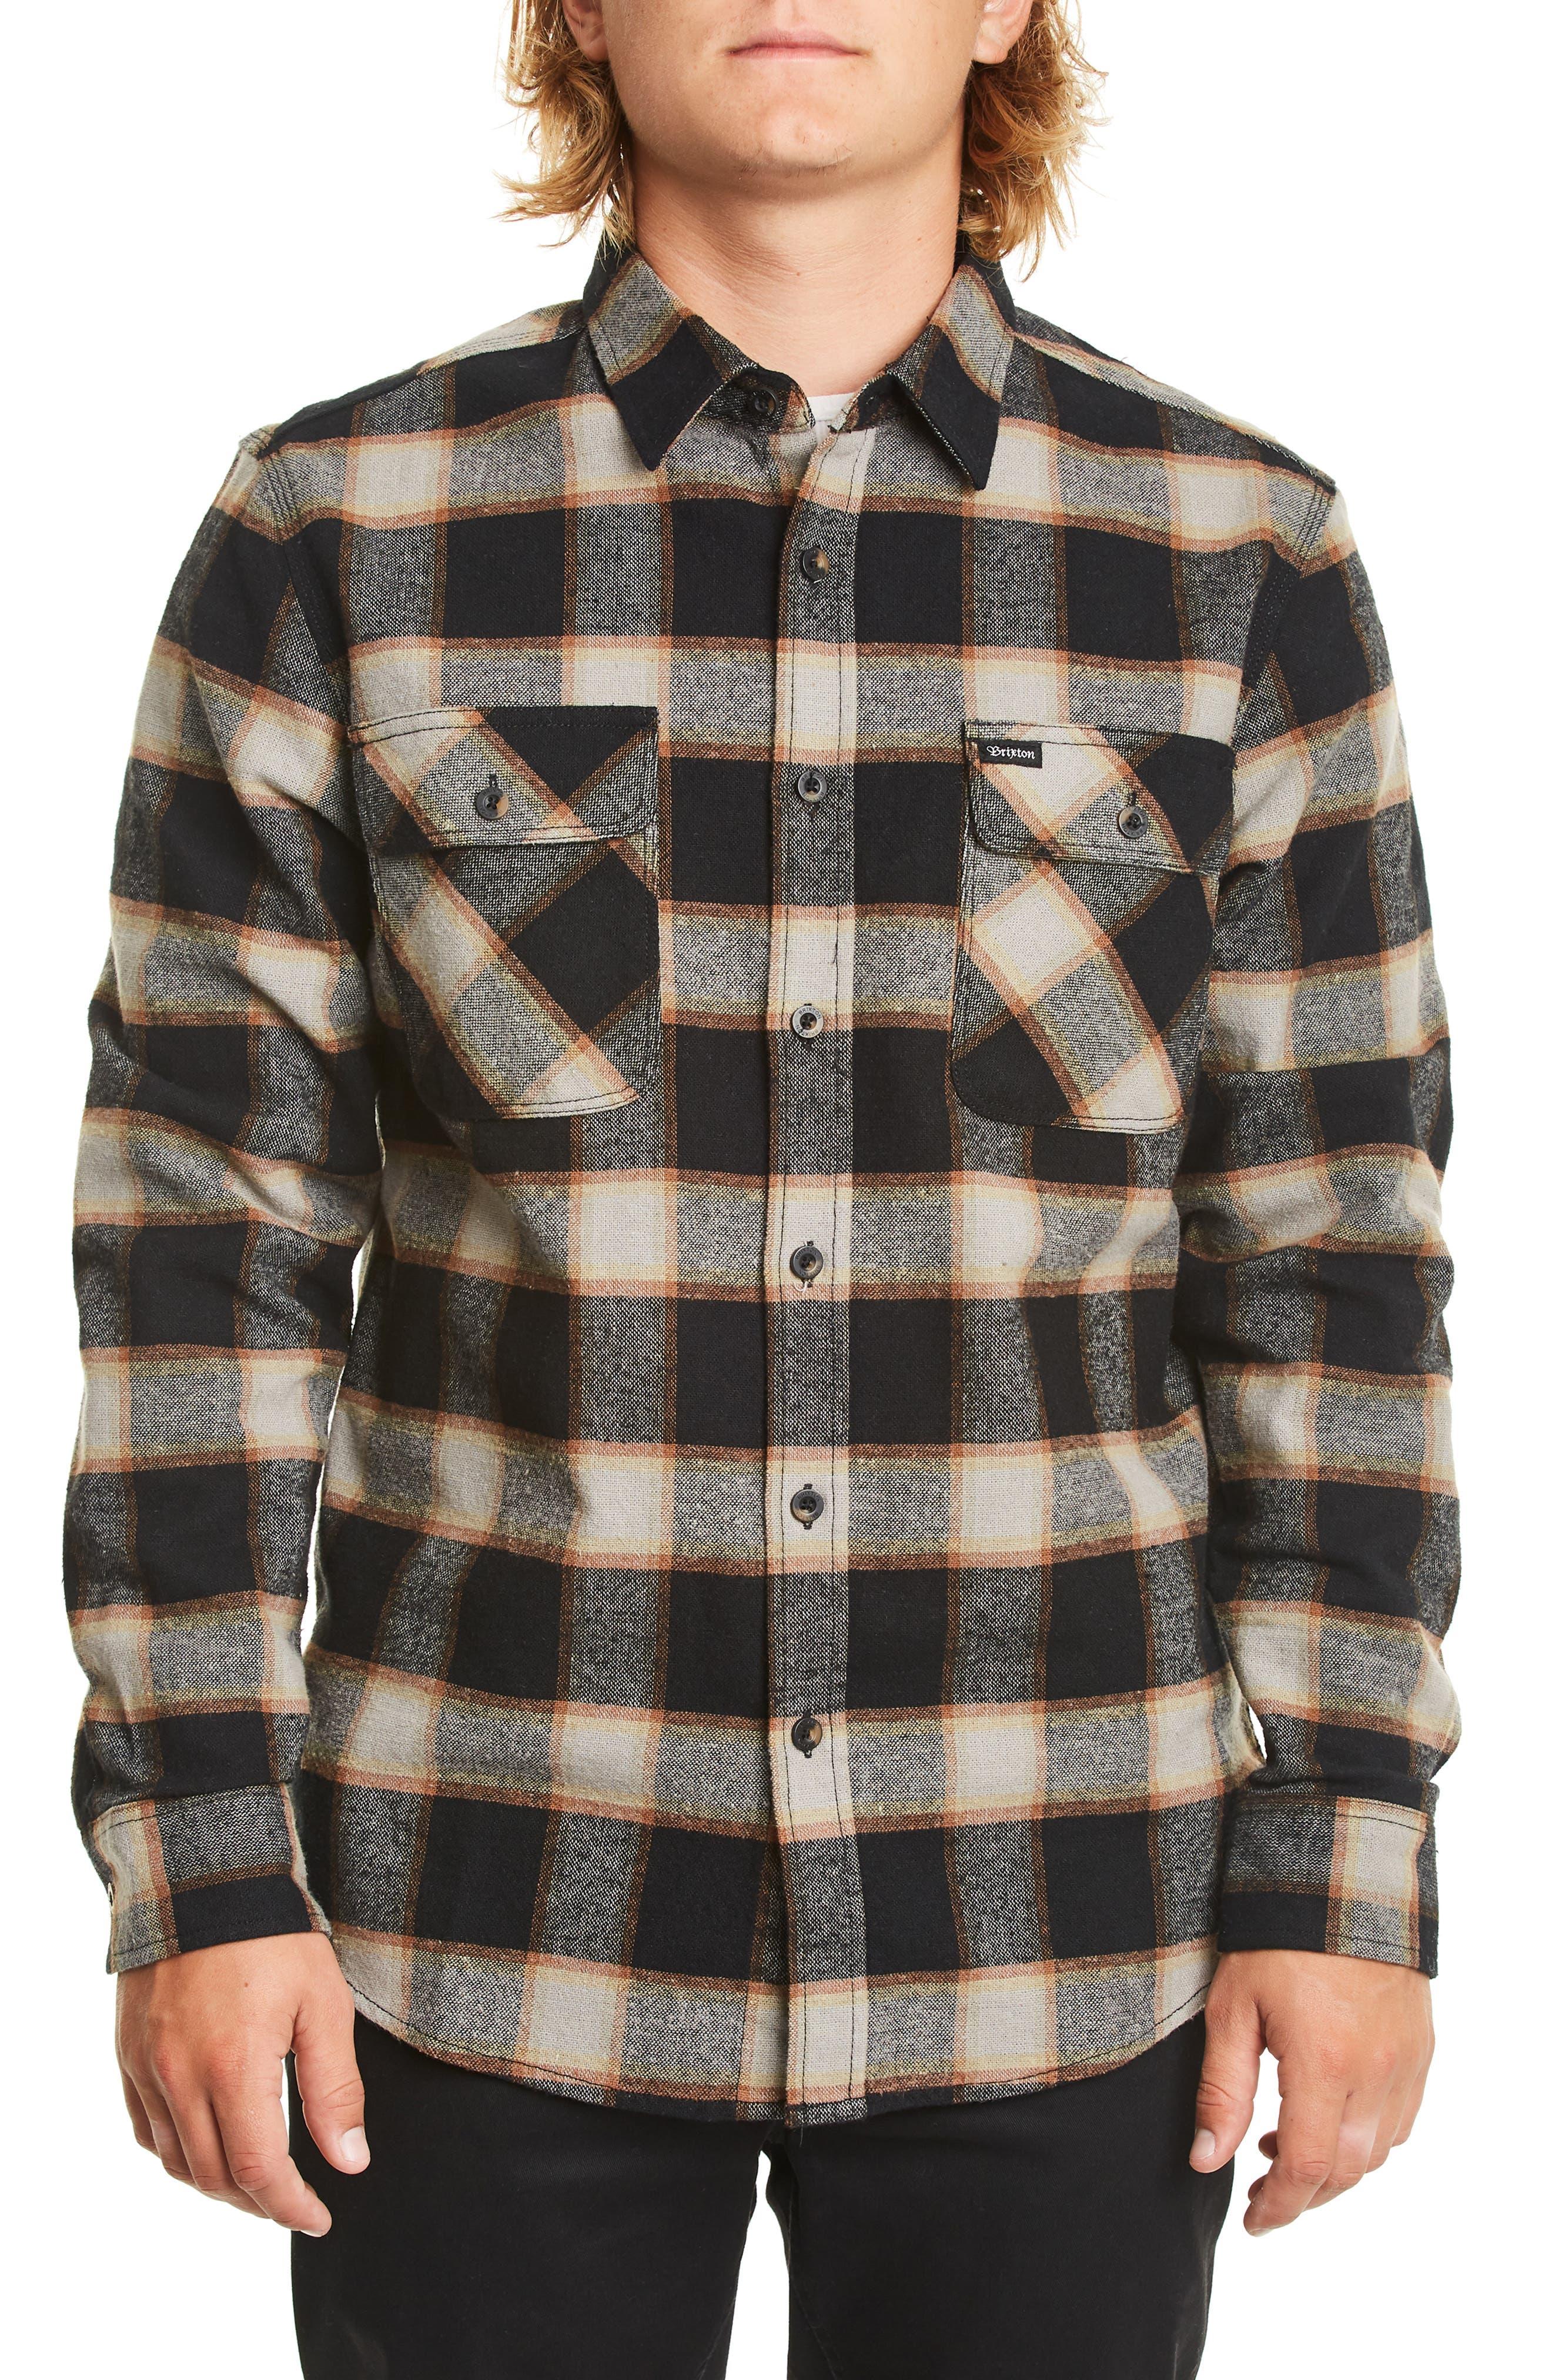 Brixton Bowery Flannel Shirt, Black